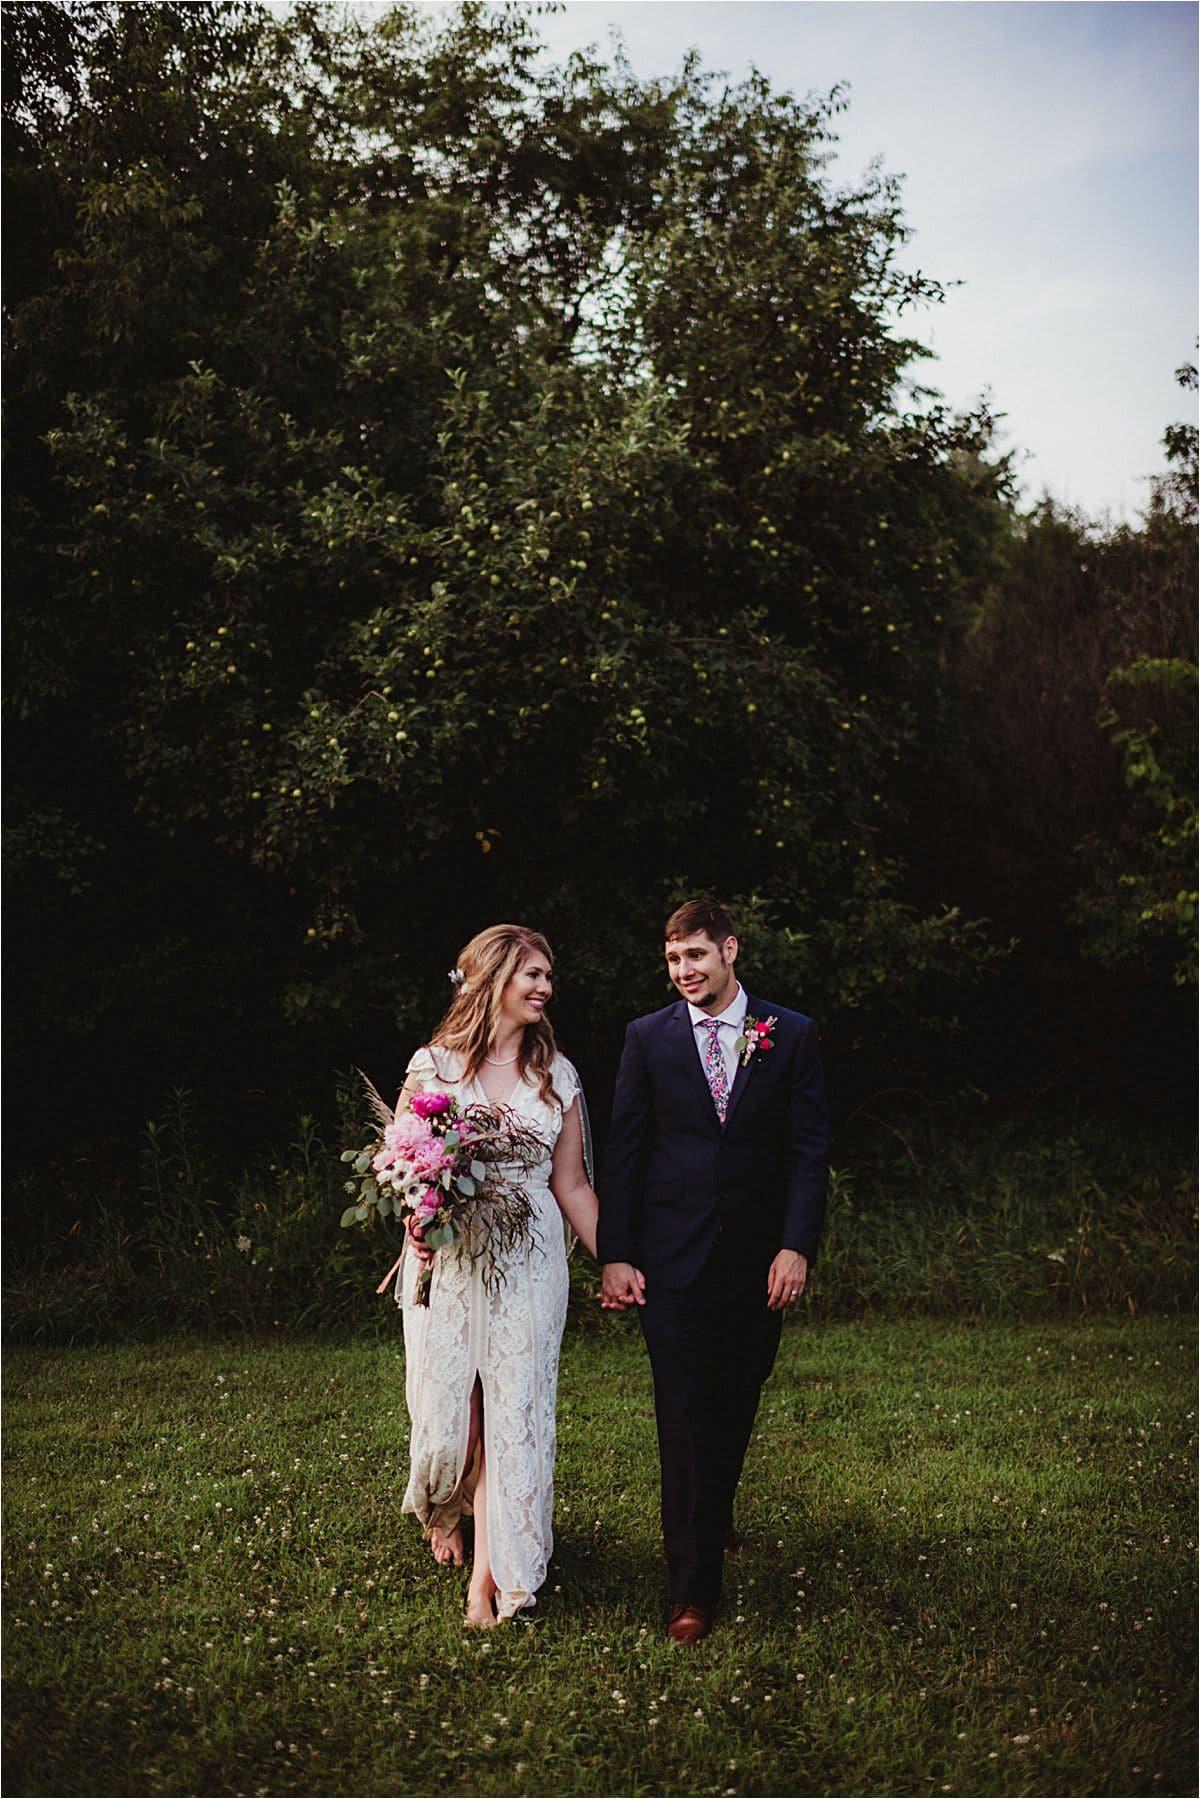 Couple's Favorite Wedding Image